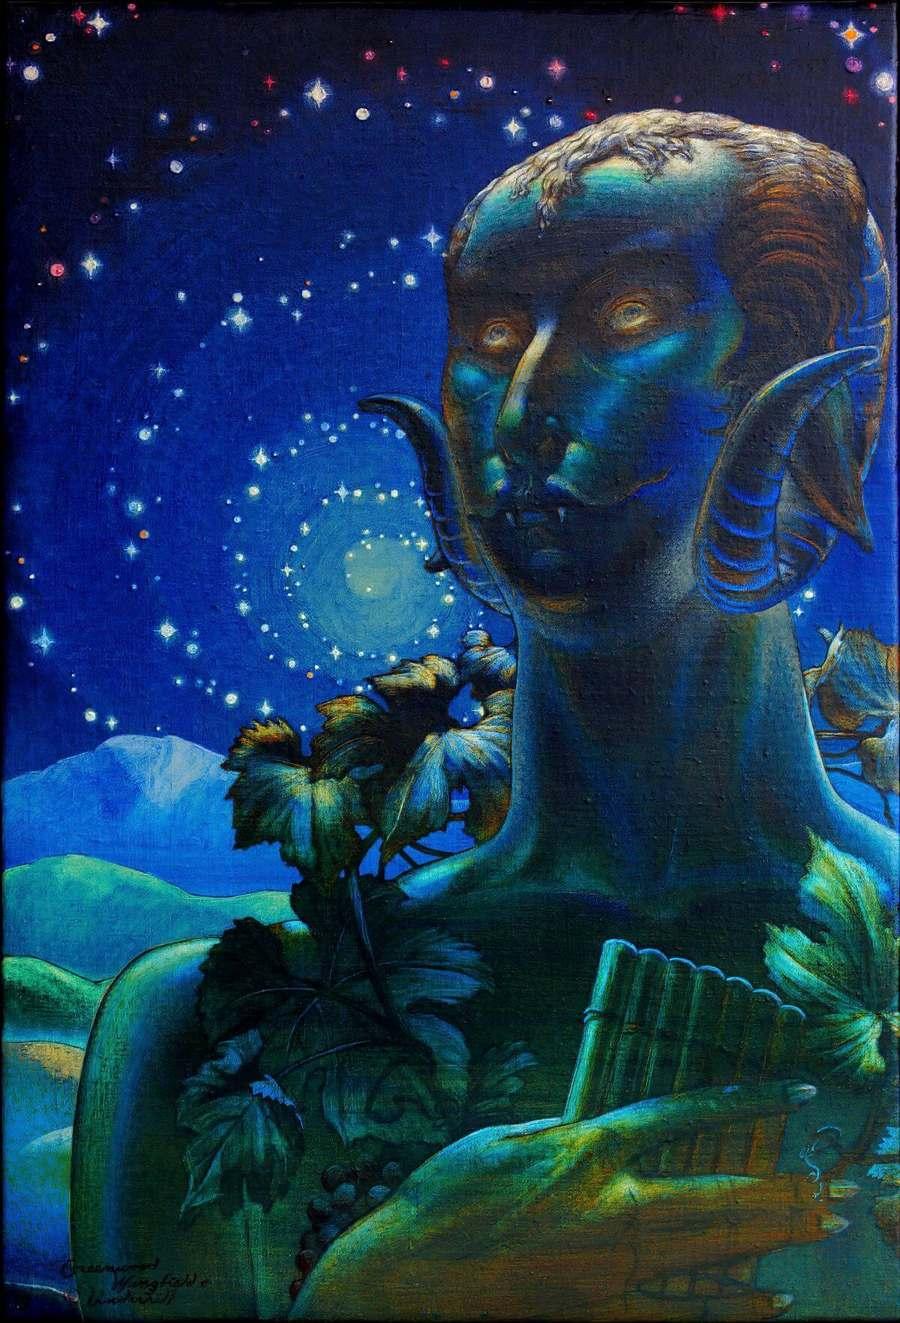 Lou P. Rogers Fantasy Art Oil Painting